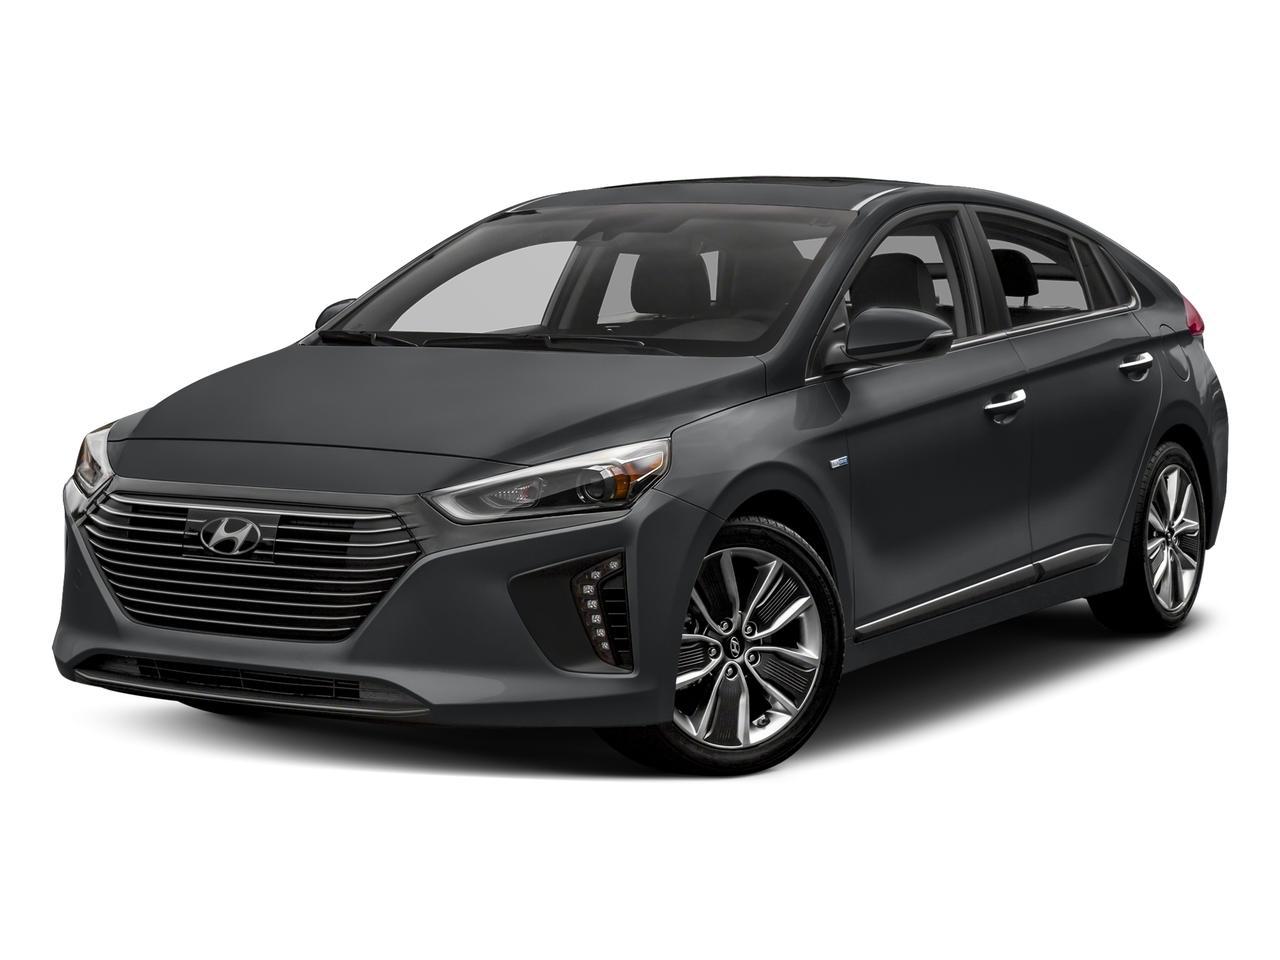 2017 Hyundai IONIQ Hybrid Vehicle Photo in Merrillville, IN 46410